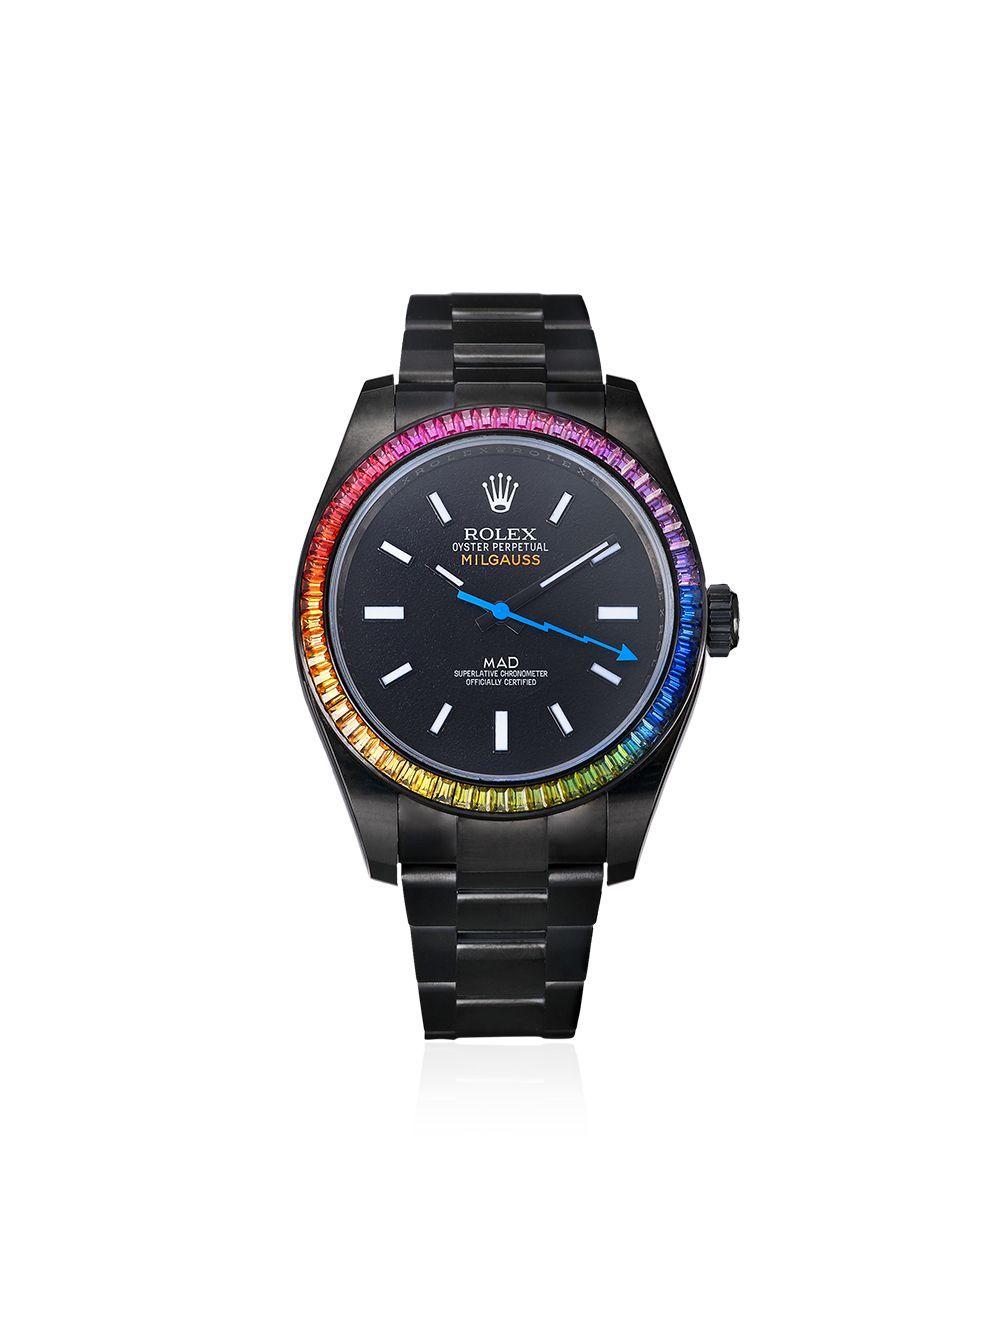 Mad Paris Customised Pre Owned Rolex Milgauss Rainbow 35mm Farfetch Rolex Milgauss Second Hand Watches Rolex